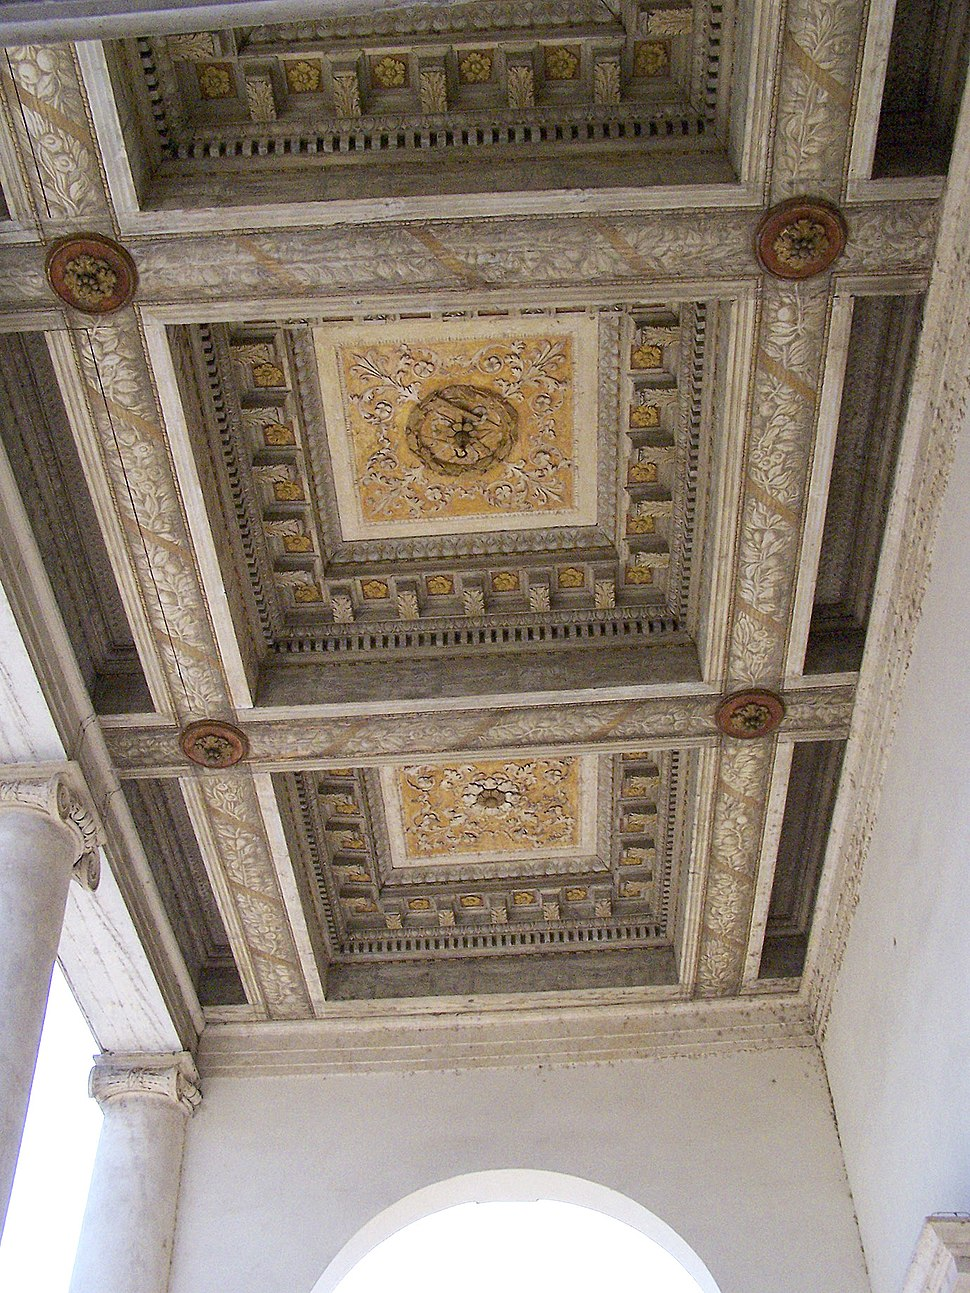 Villa Chiericati ceiling beams 2